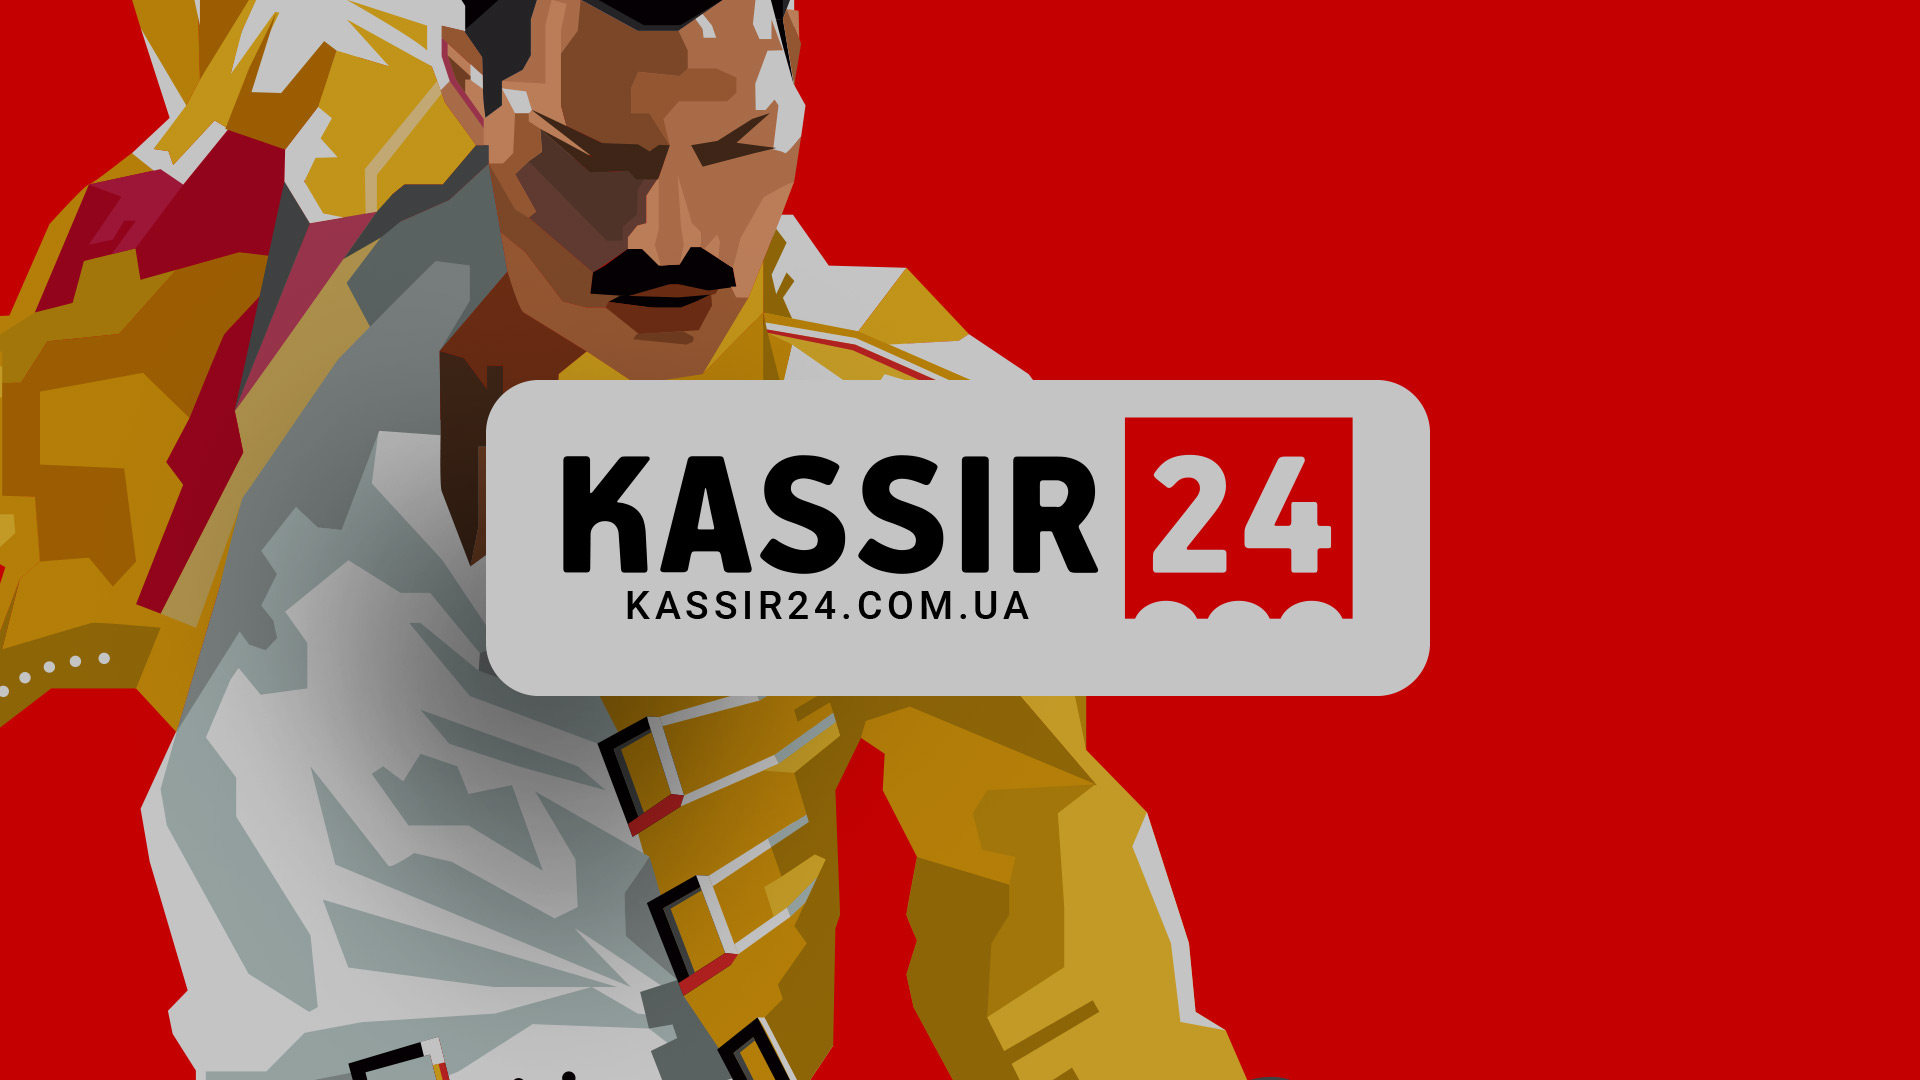 Kassir24